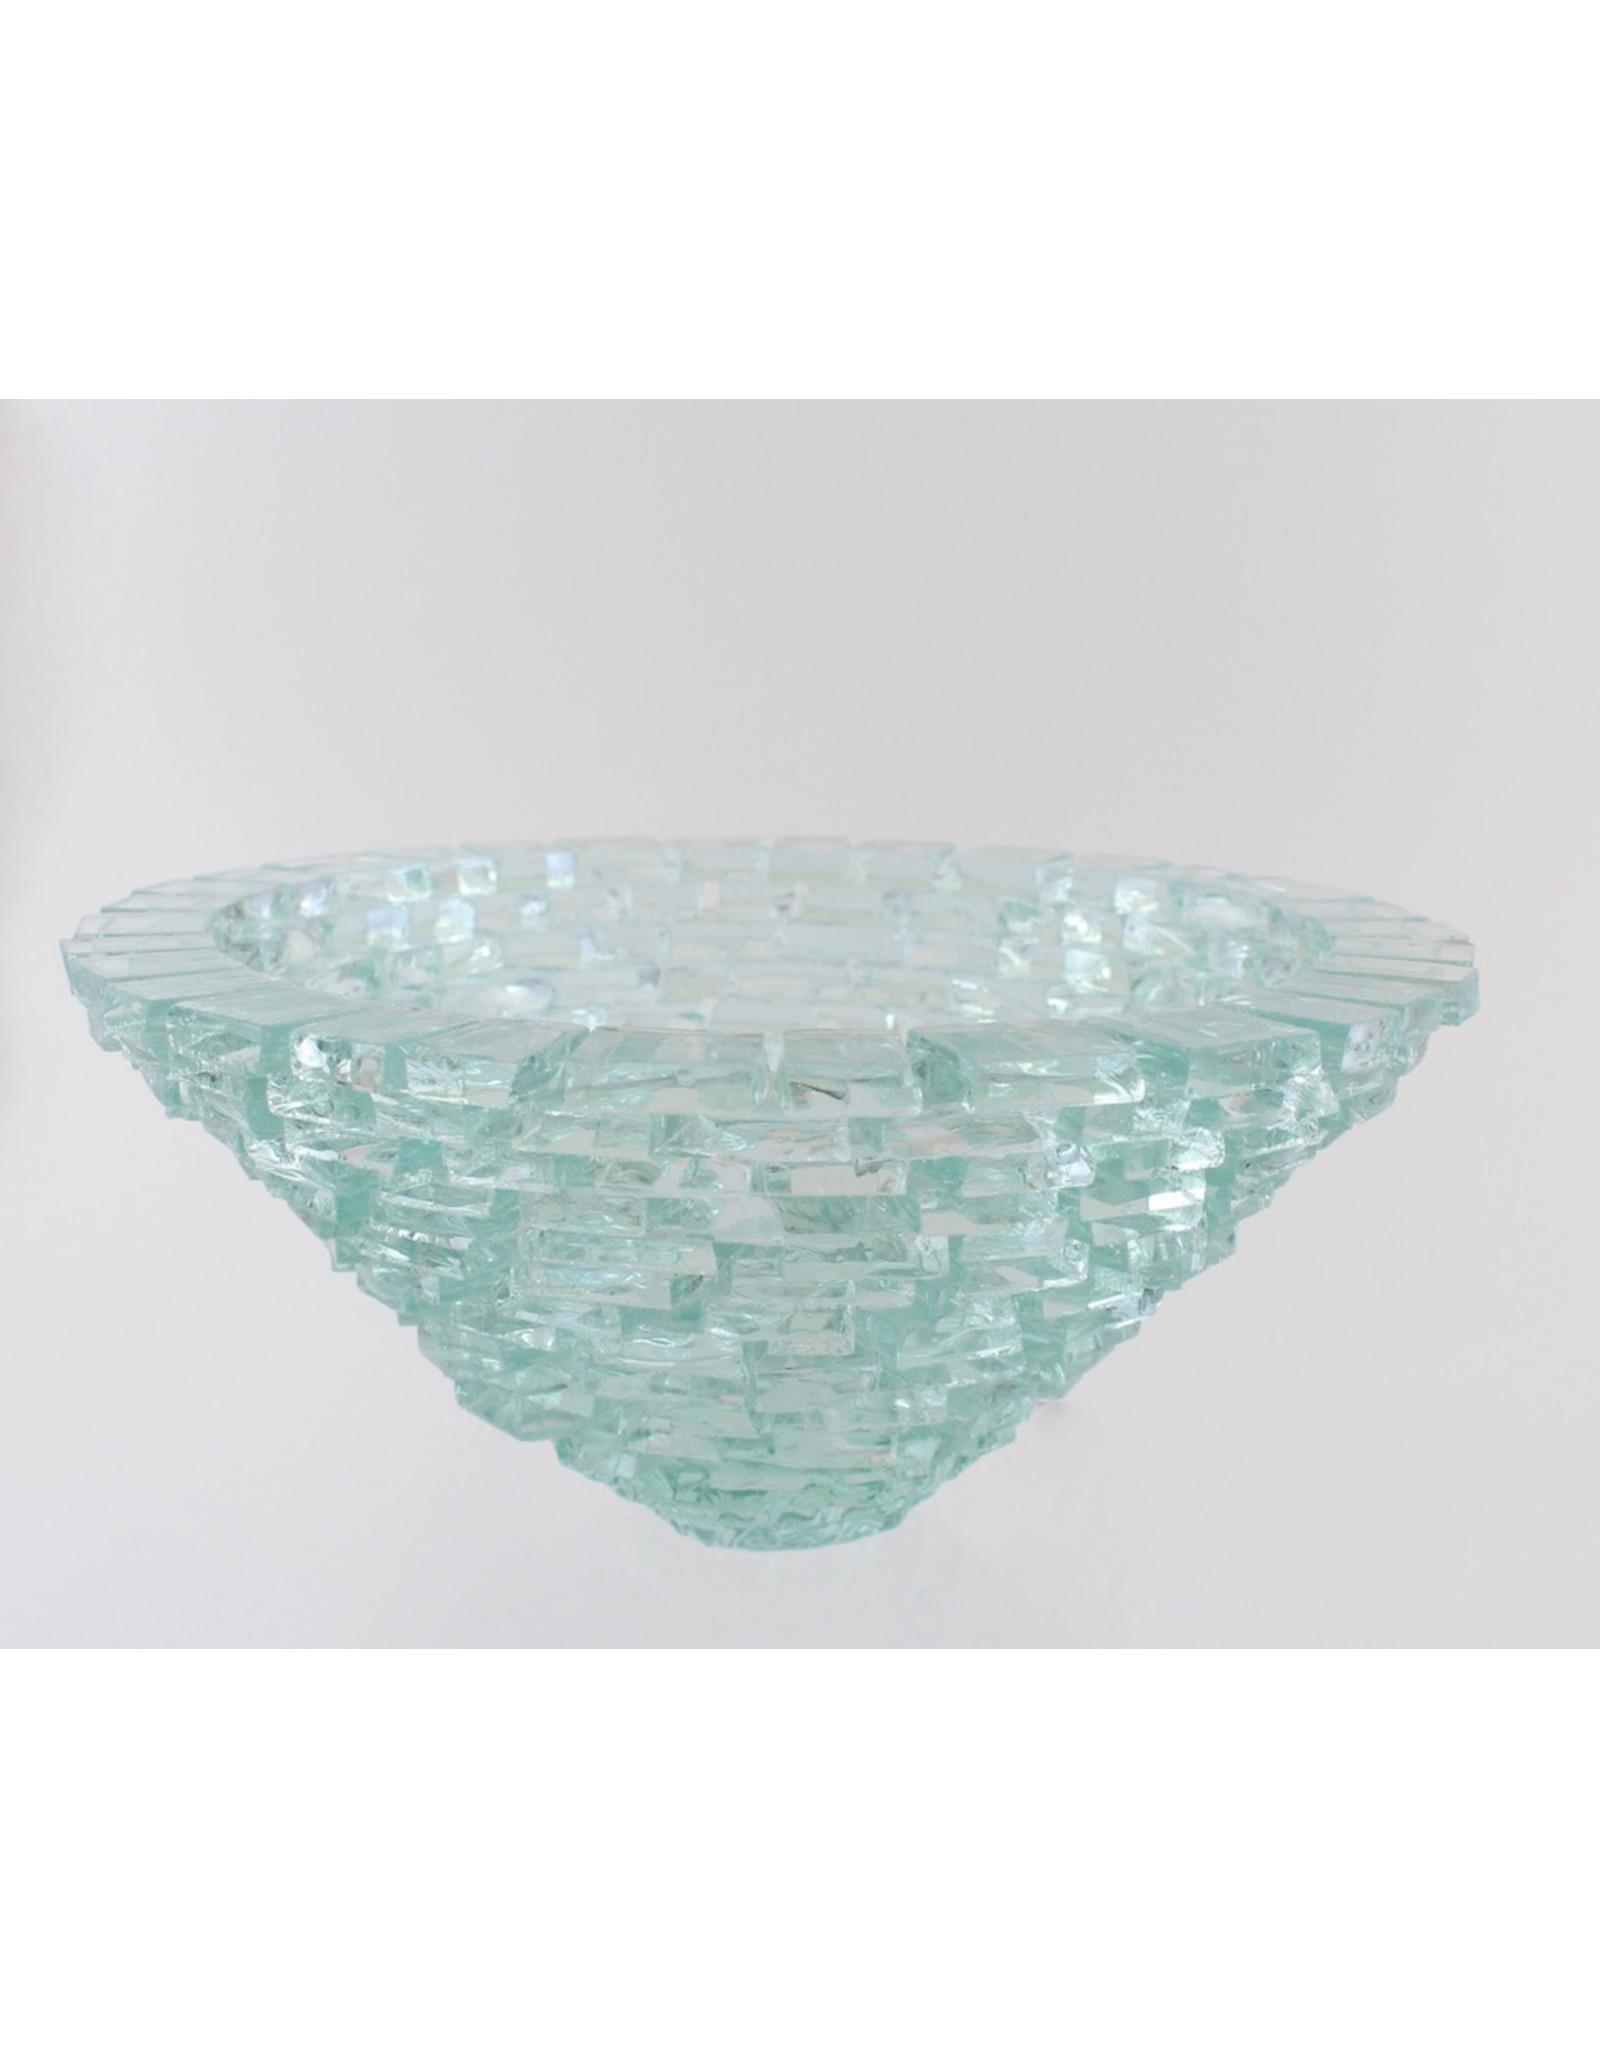 GUNDI Deco Bowl by Gundi